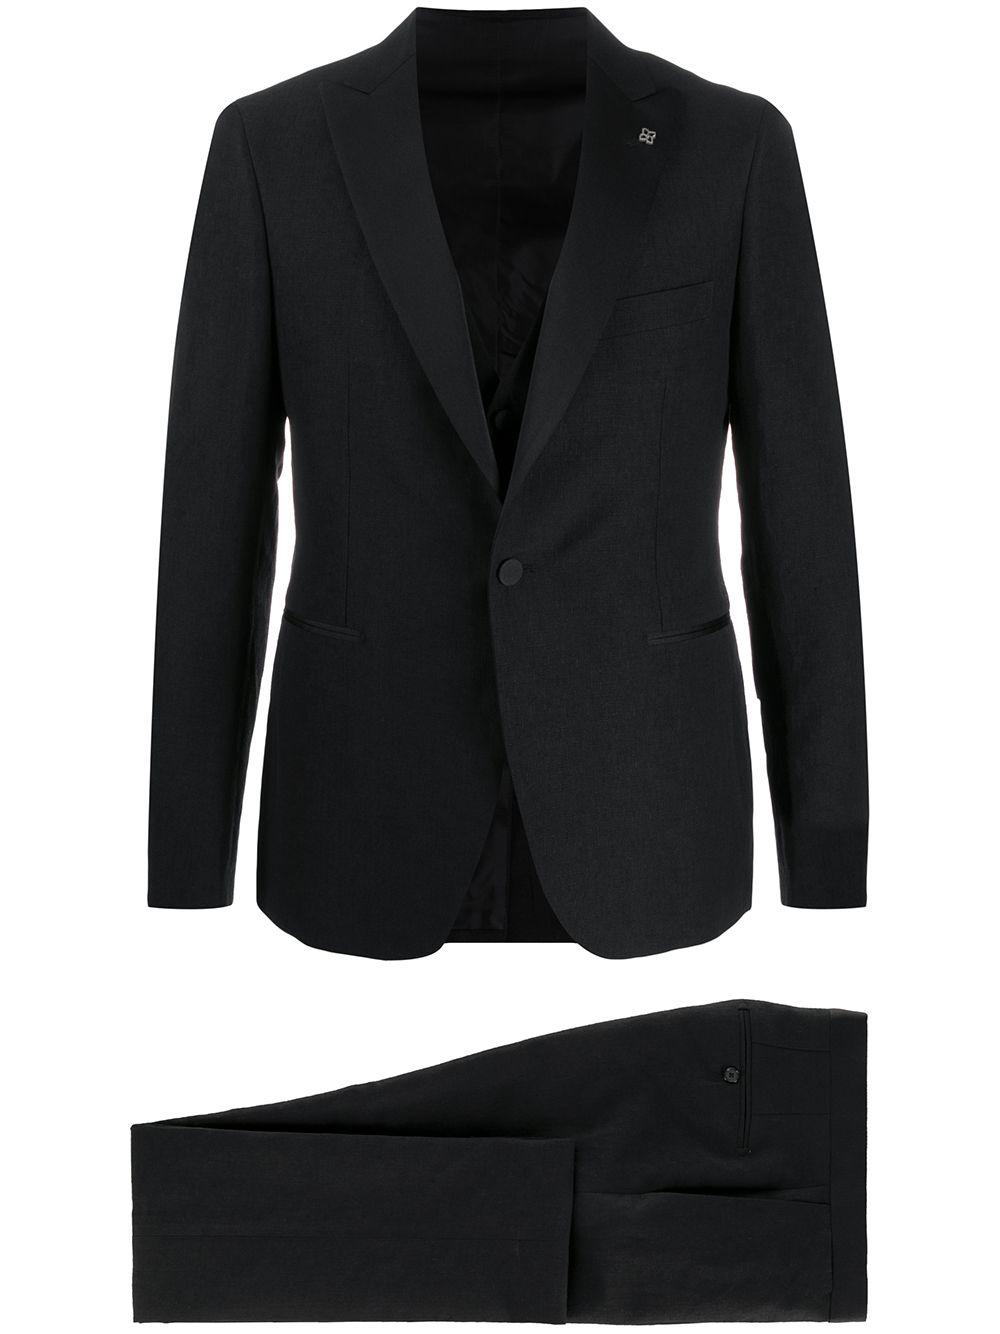 Tagliatore formal suit - Black